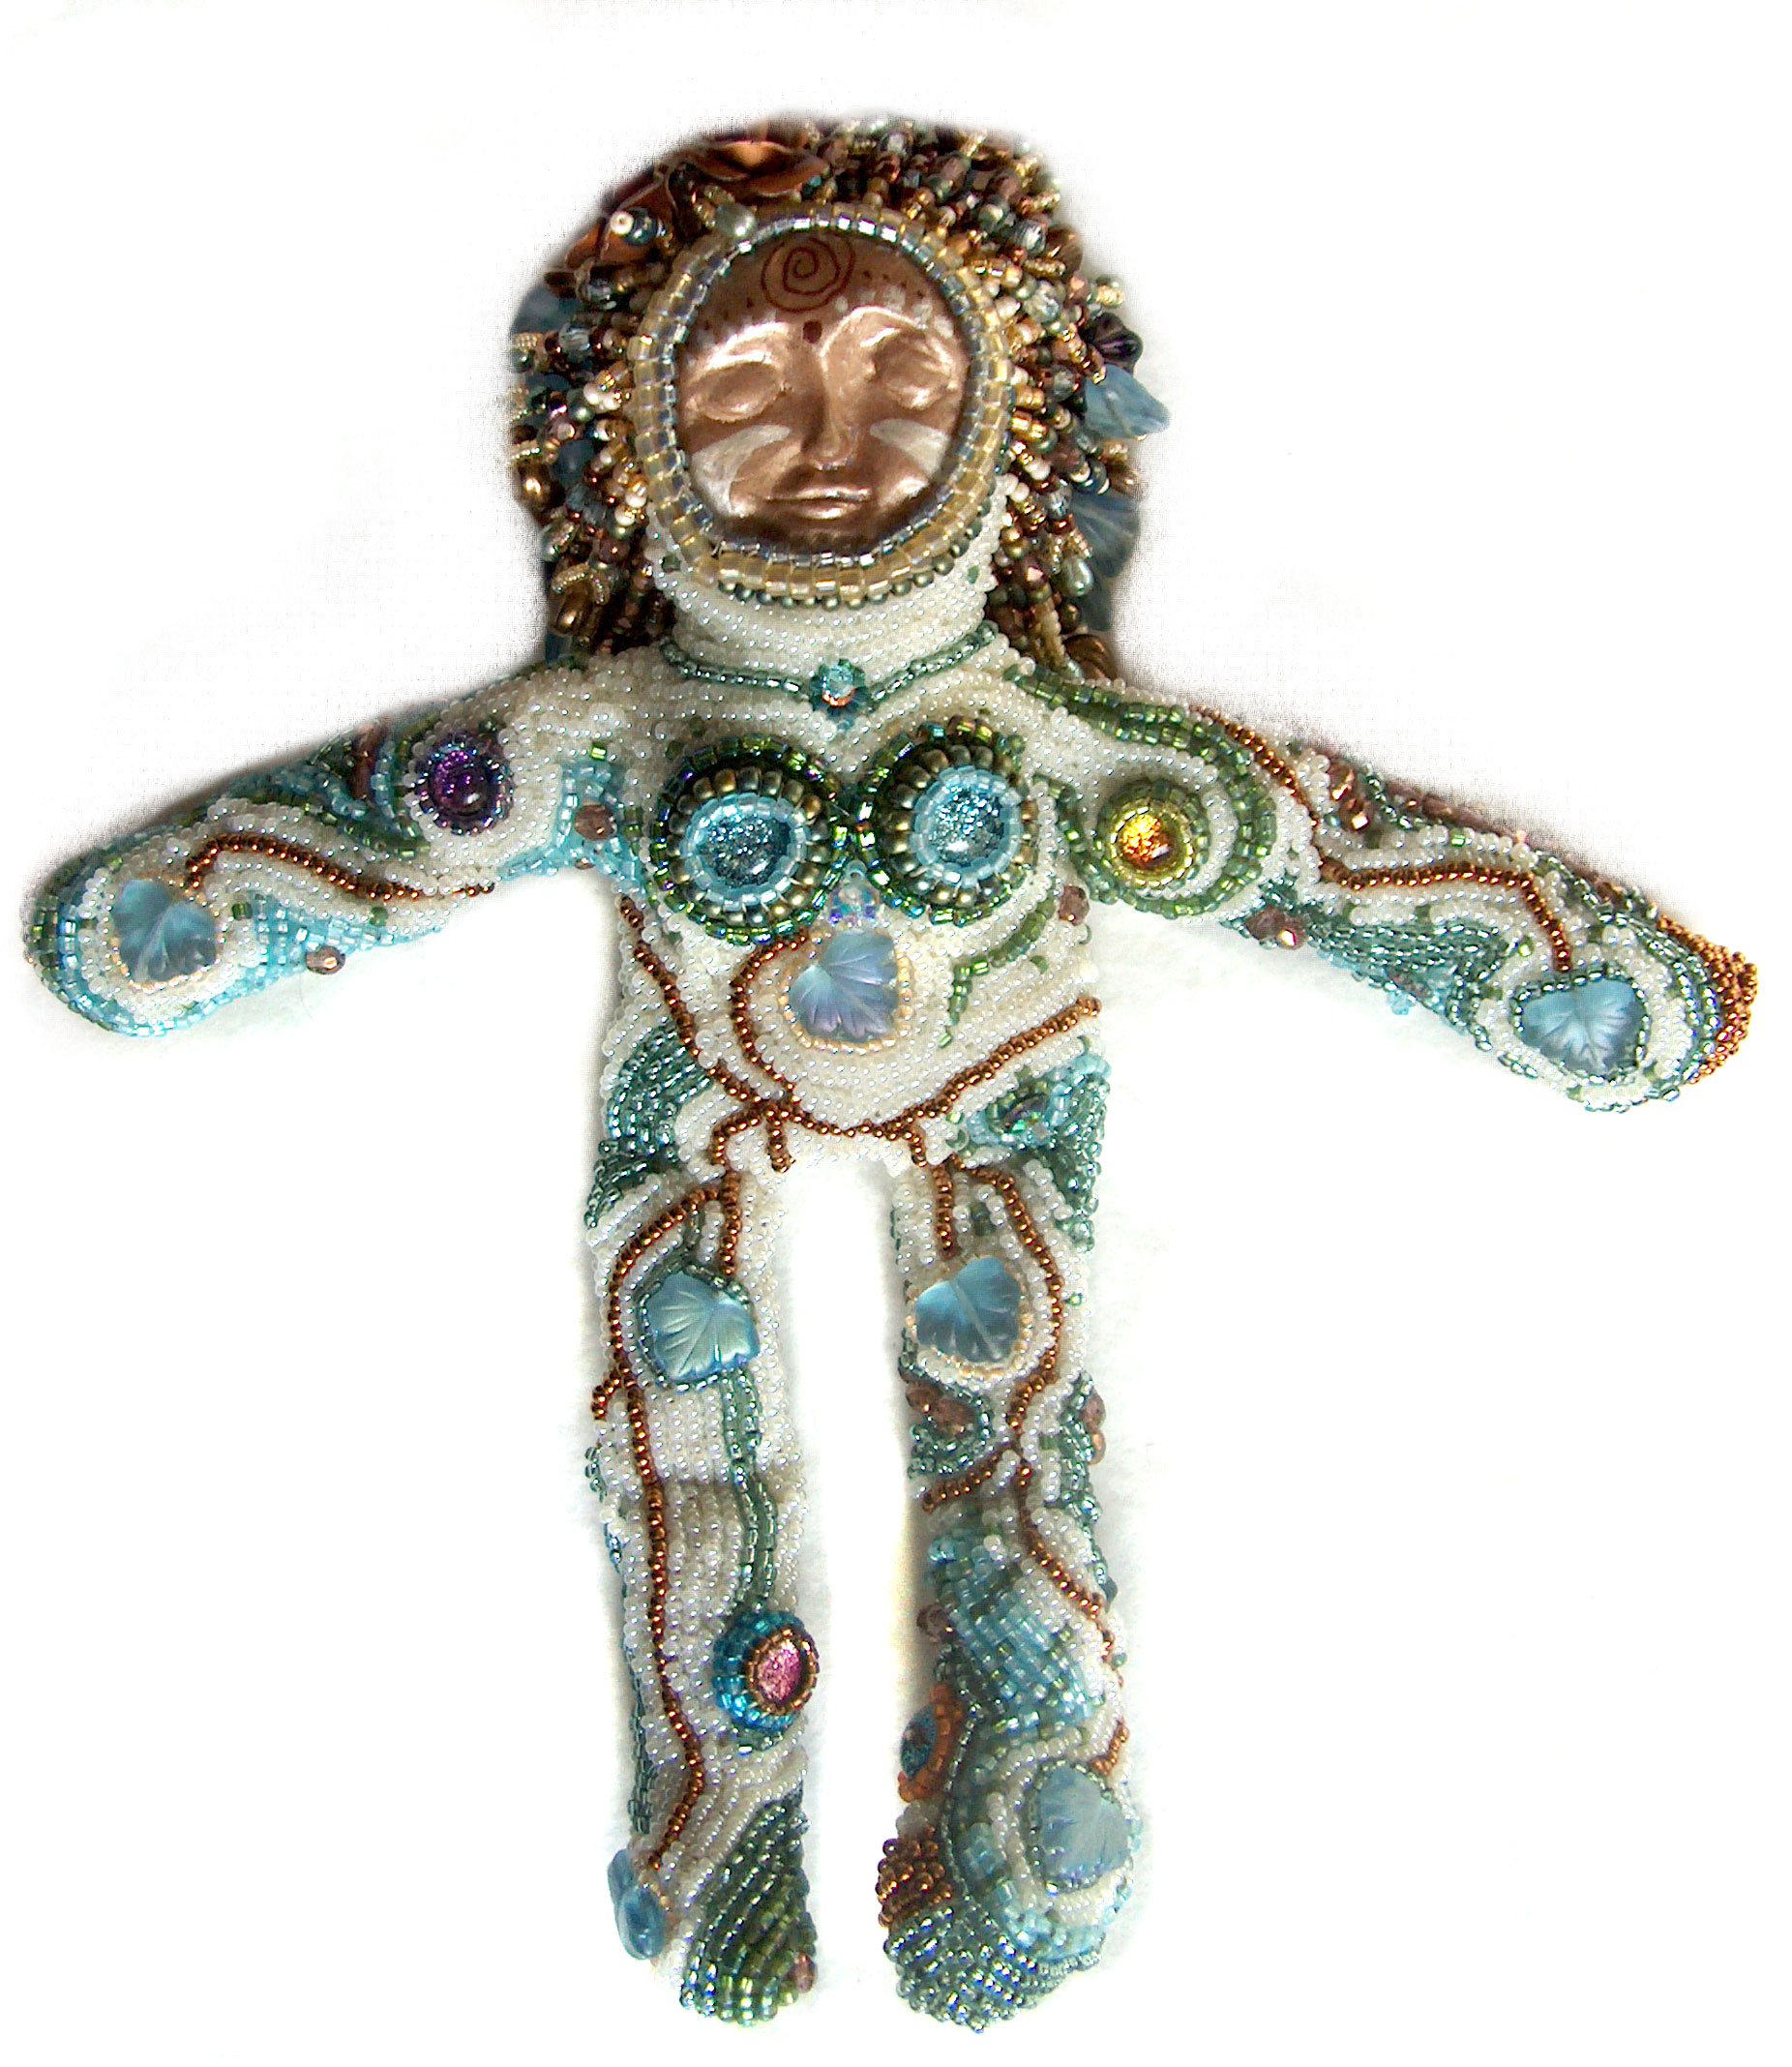 beaded spirit doll with ceramic face Laura Sandoval